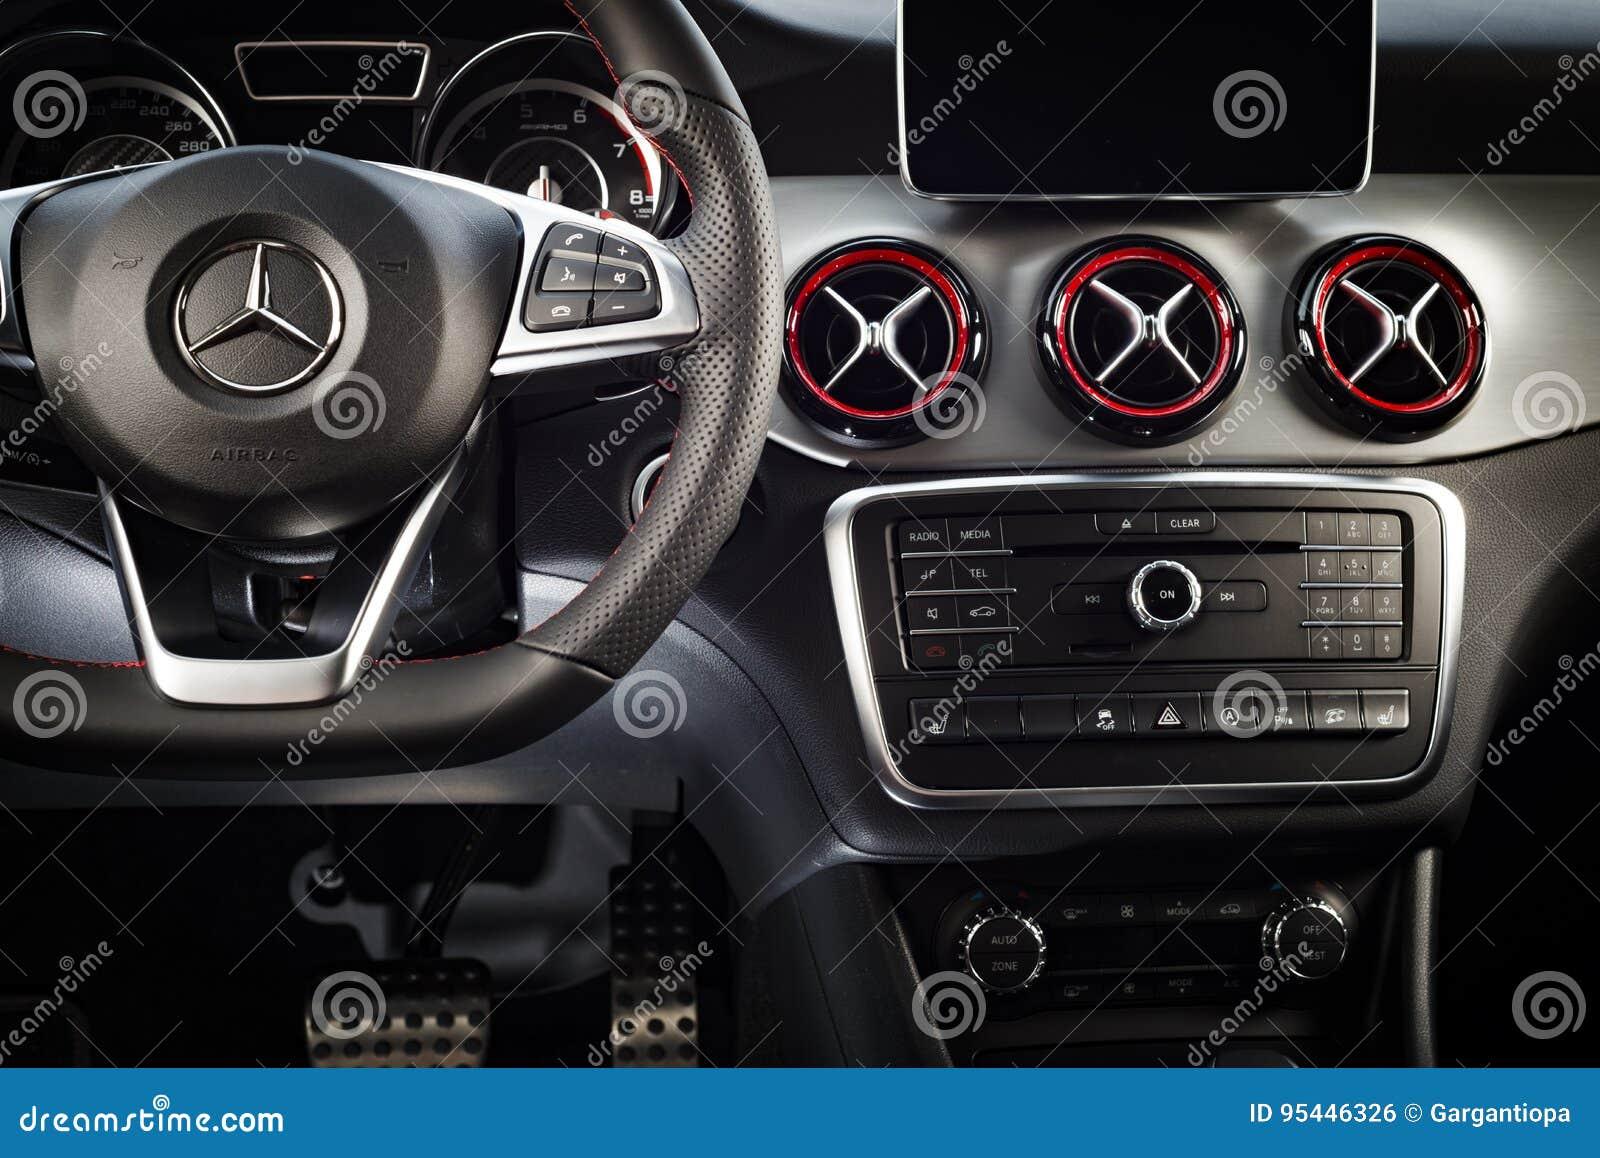 Mercedes Benz Cla 45 2016 Amg Interior Editorial Photo Image Of